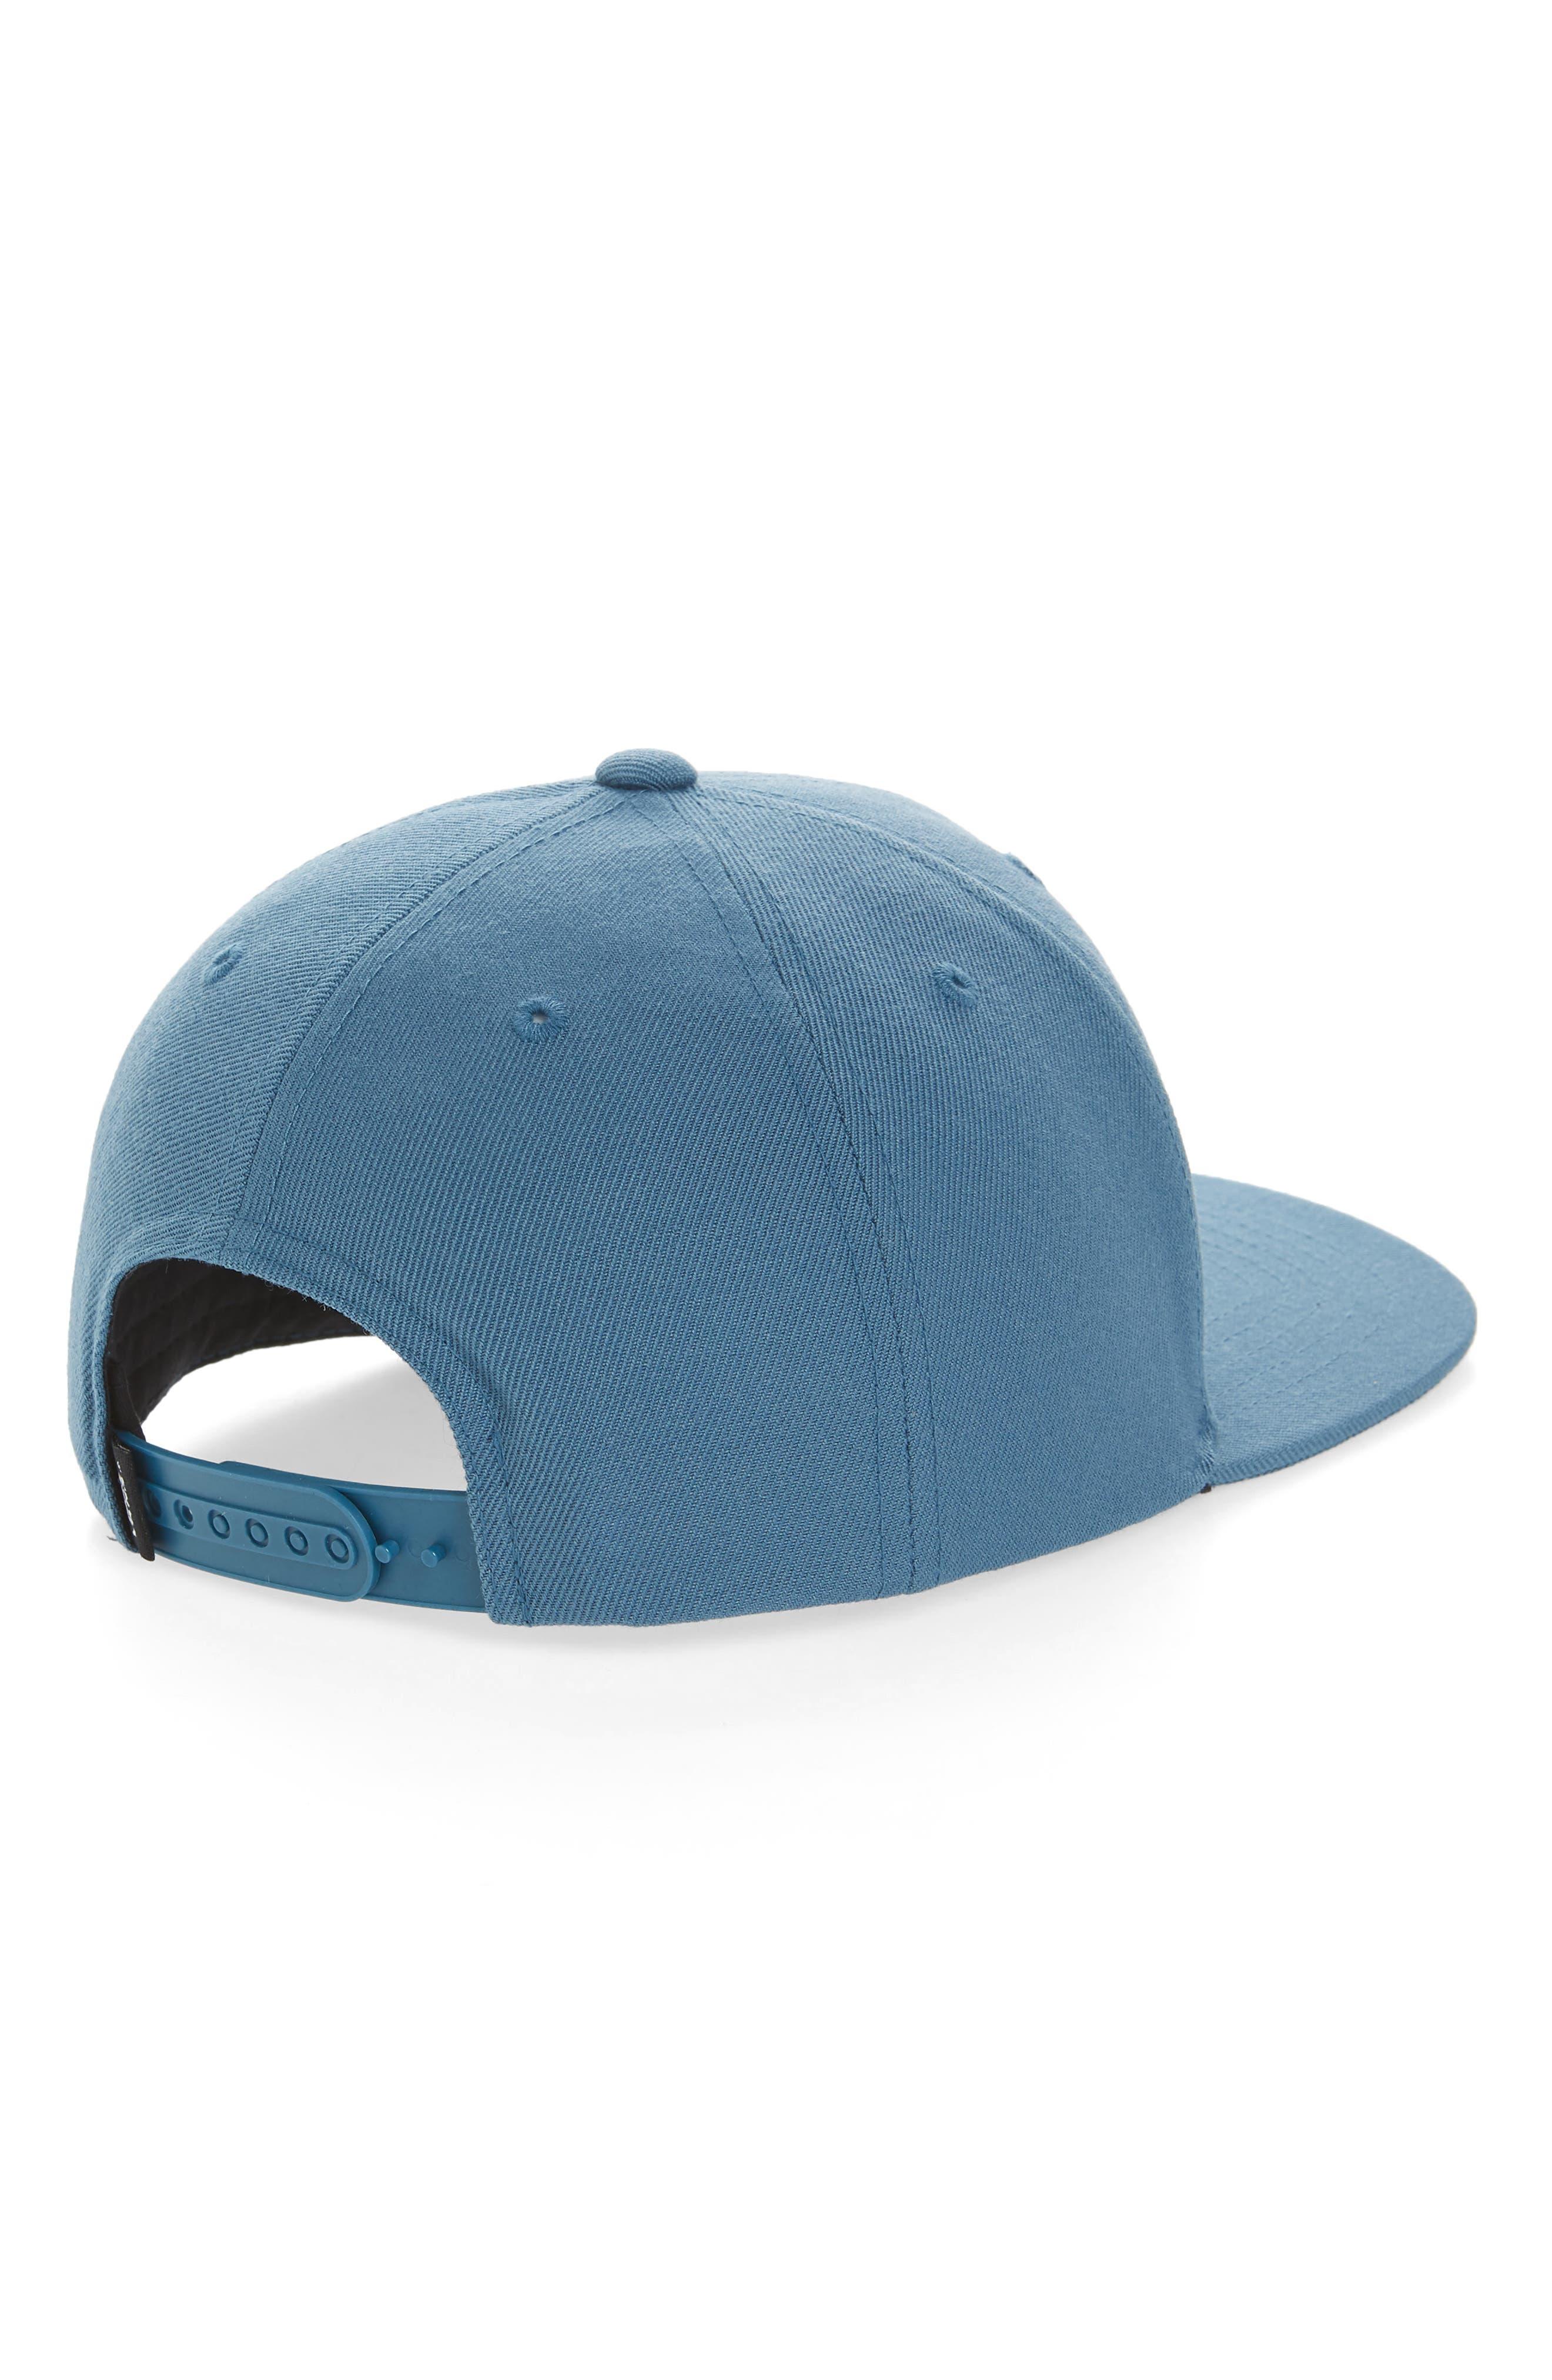 Drop V II Trucker Hat,                             Alternate thumbnail 2, color,                             440